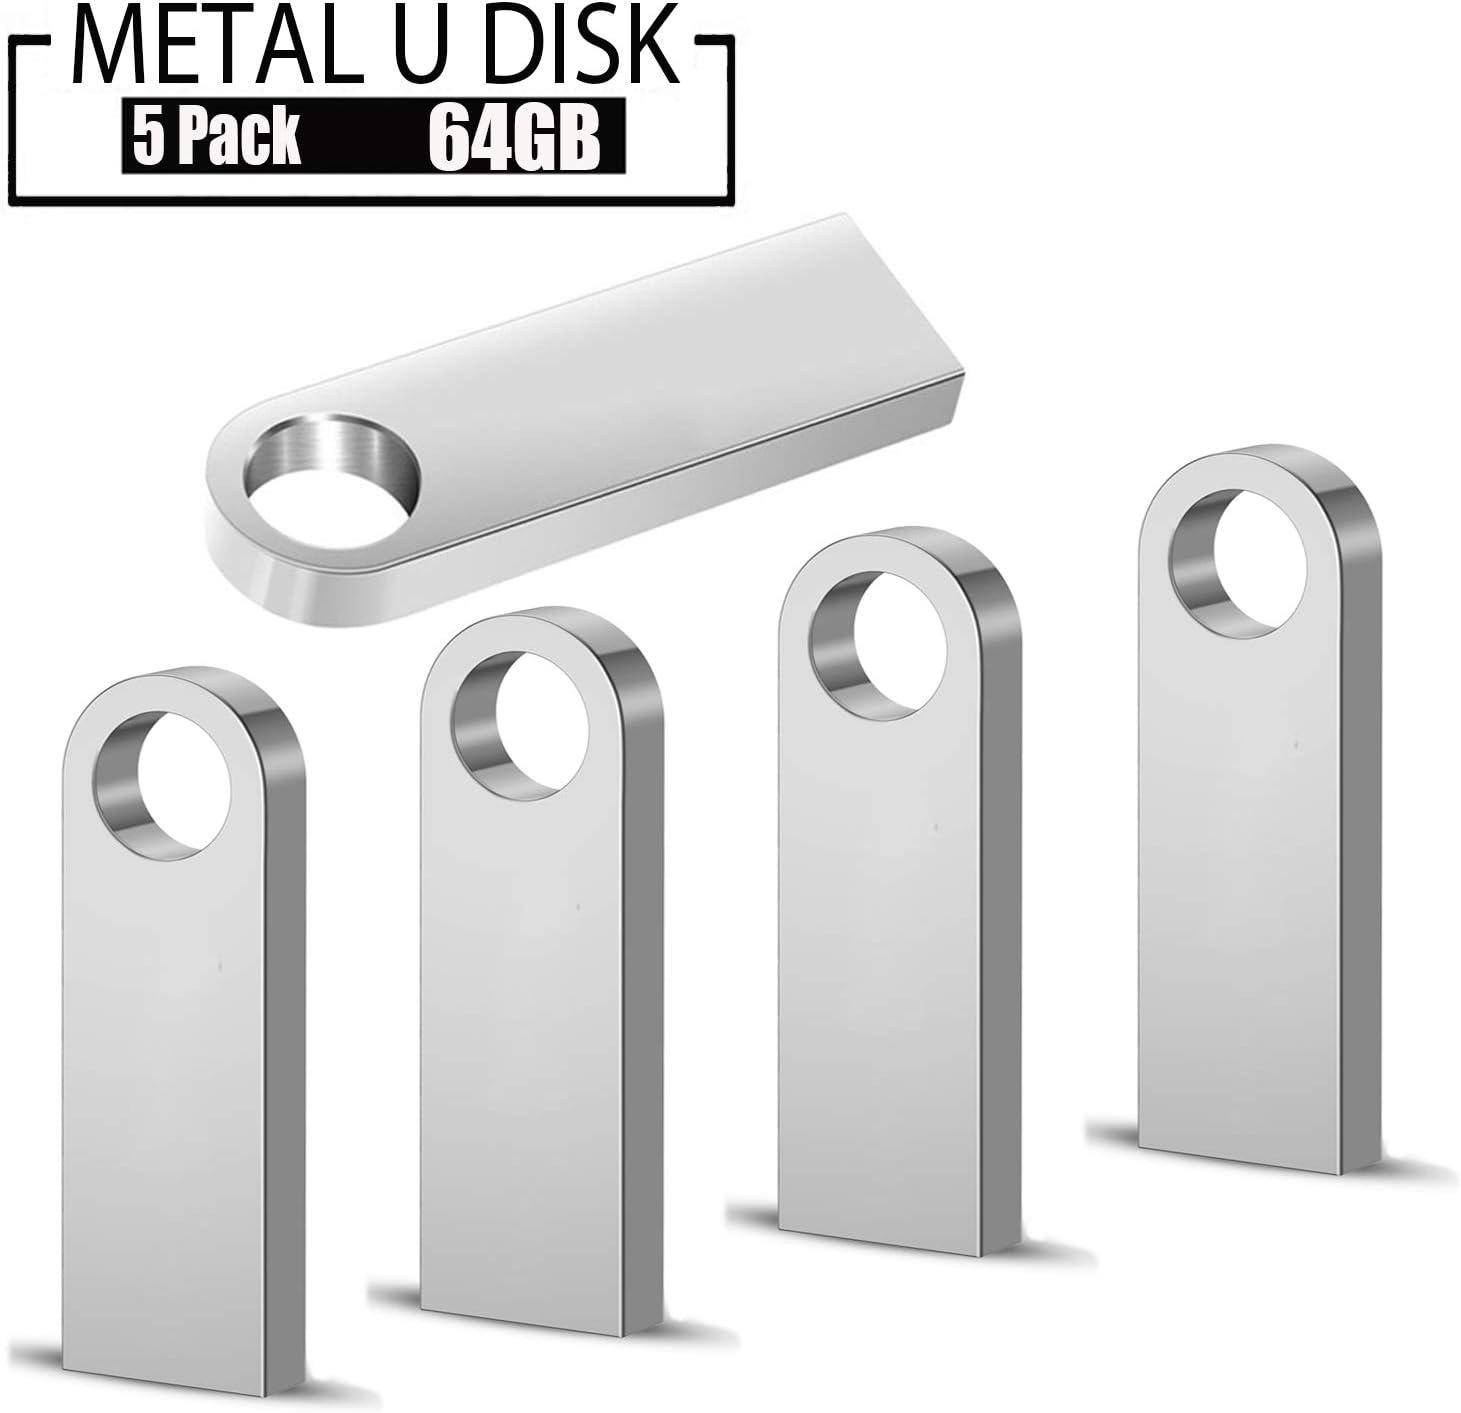 USB Flash Drive,5 Pack 64 GB Pen Thumb USB 2.0 Drives Metal Casing Waterprof Jump Drive Memory External Storage Stick with Keychain Design